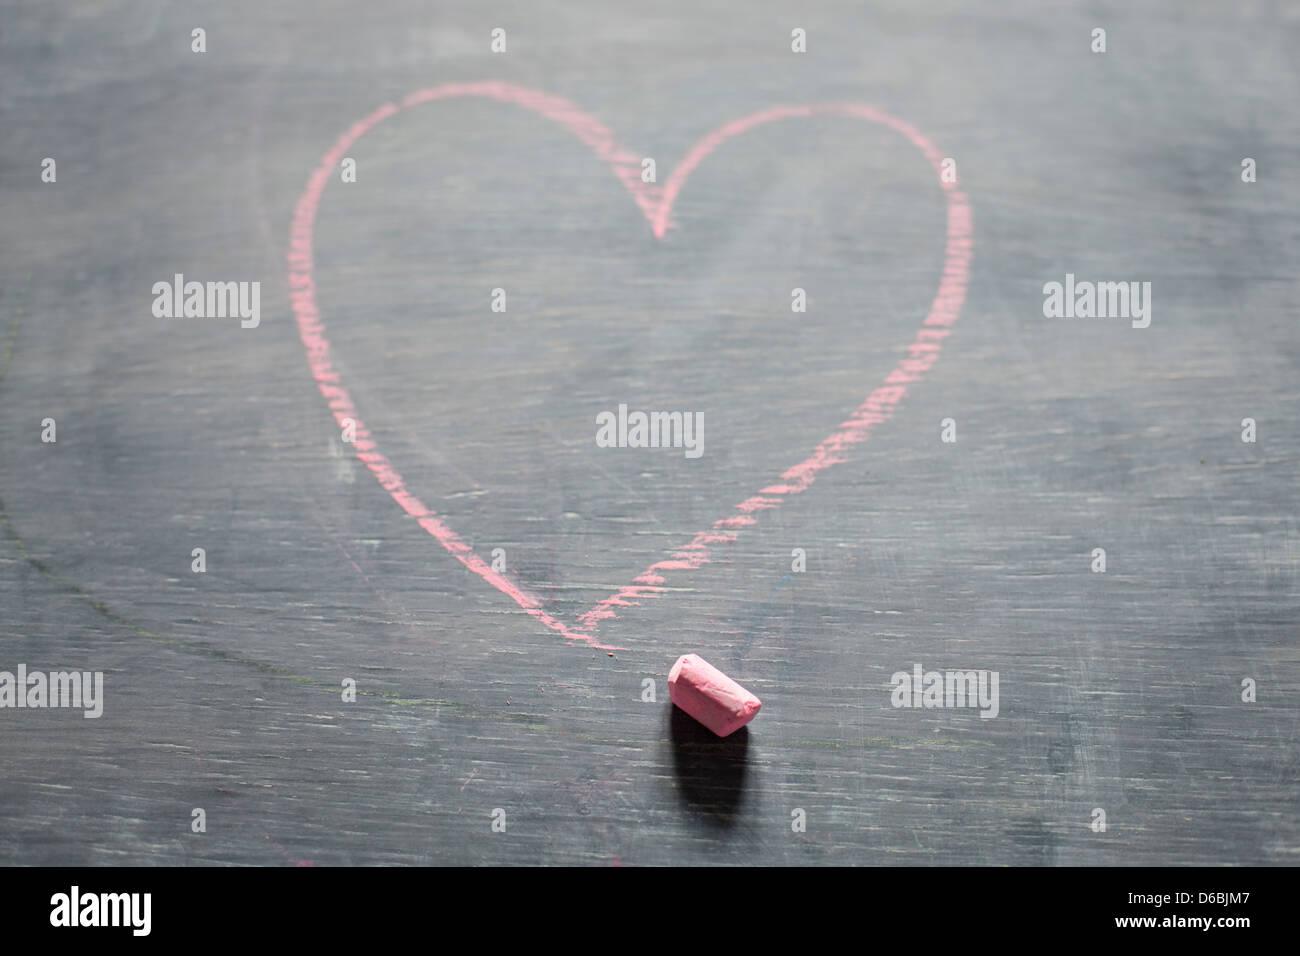 Kreide und Herz Form an Tafel Stockbild